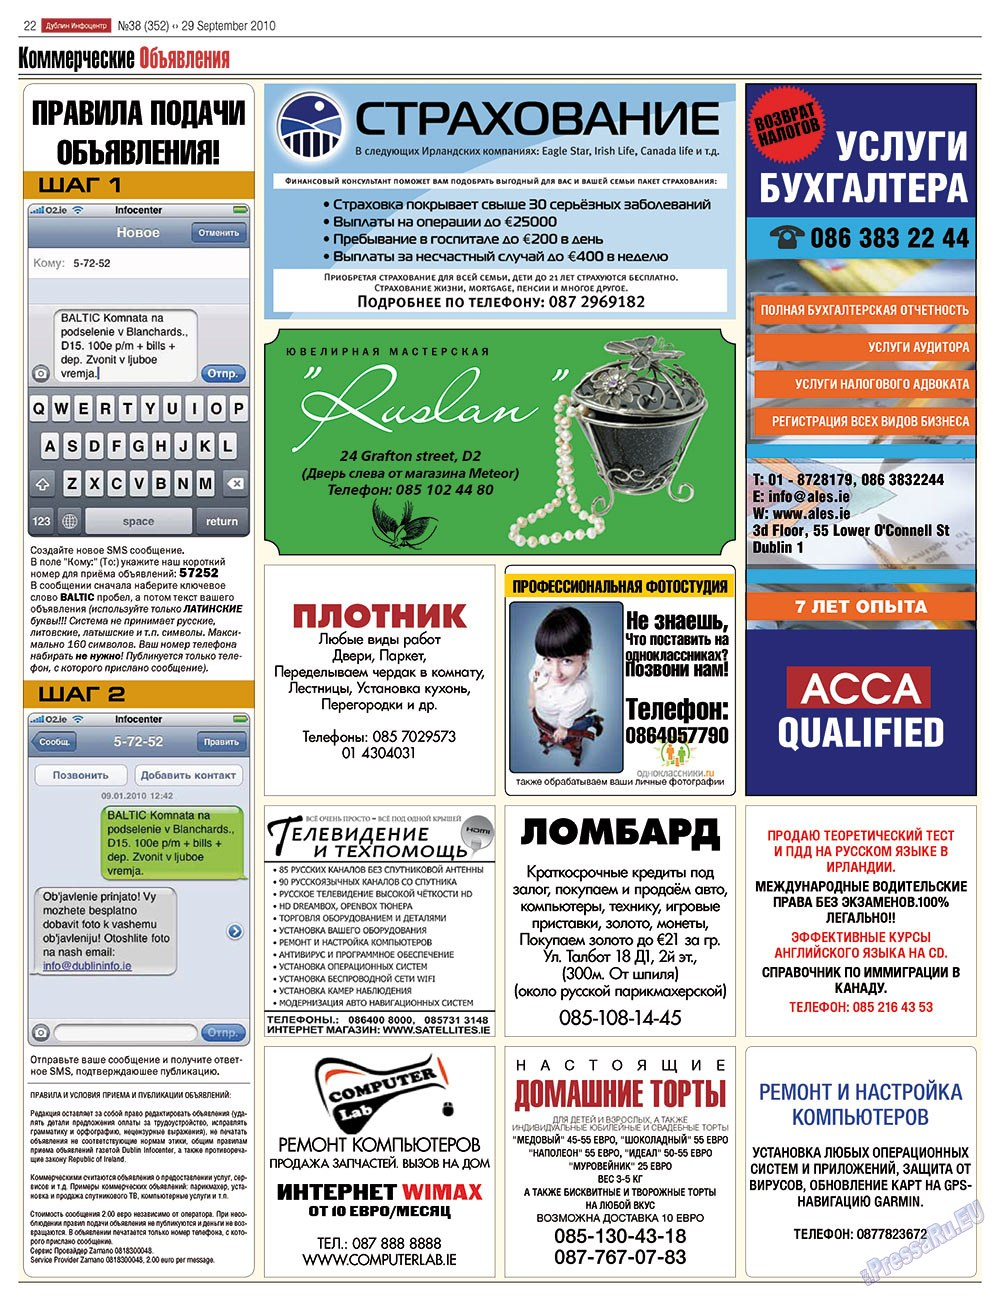 Дублин инфоцентр (газета). 2010 год, номер 38, стр. 22